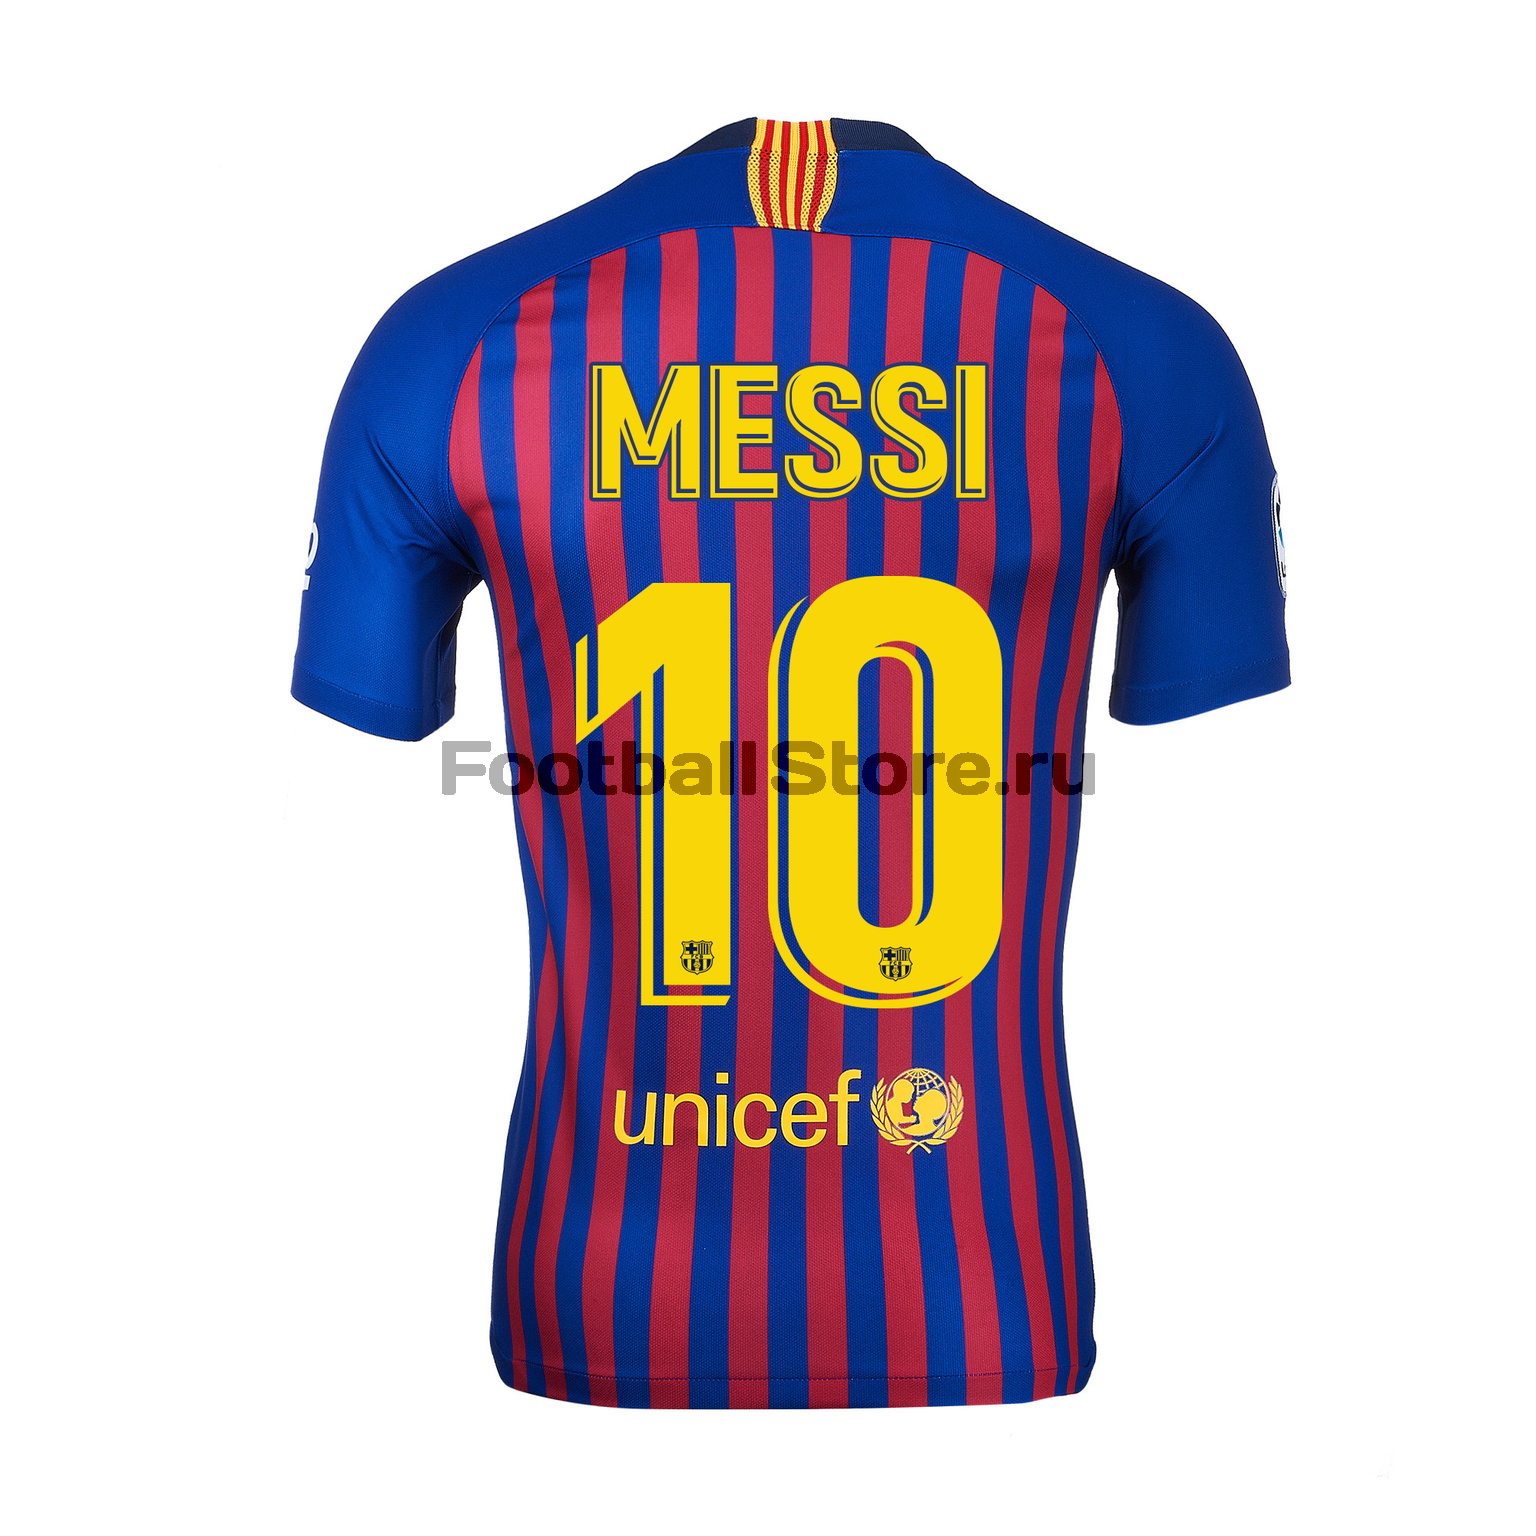 Футболка игровая домашняя Nike Барселона Месси